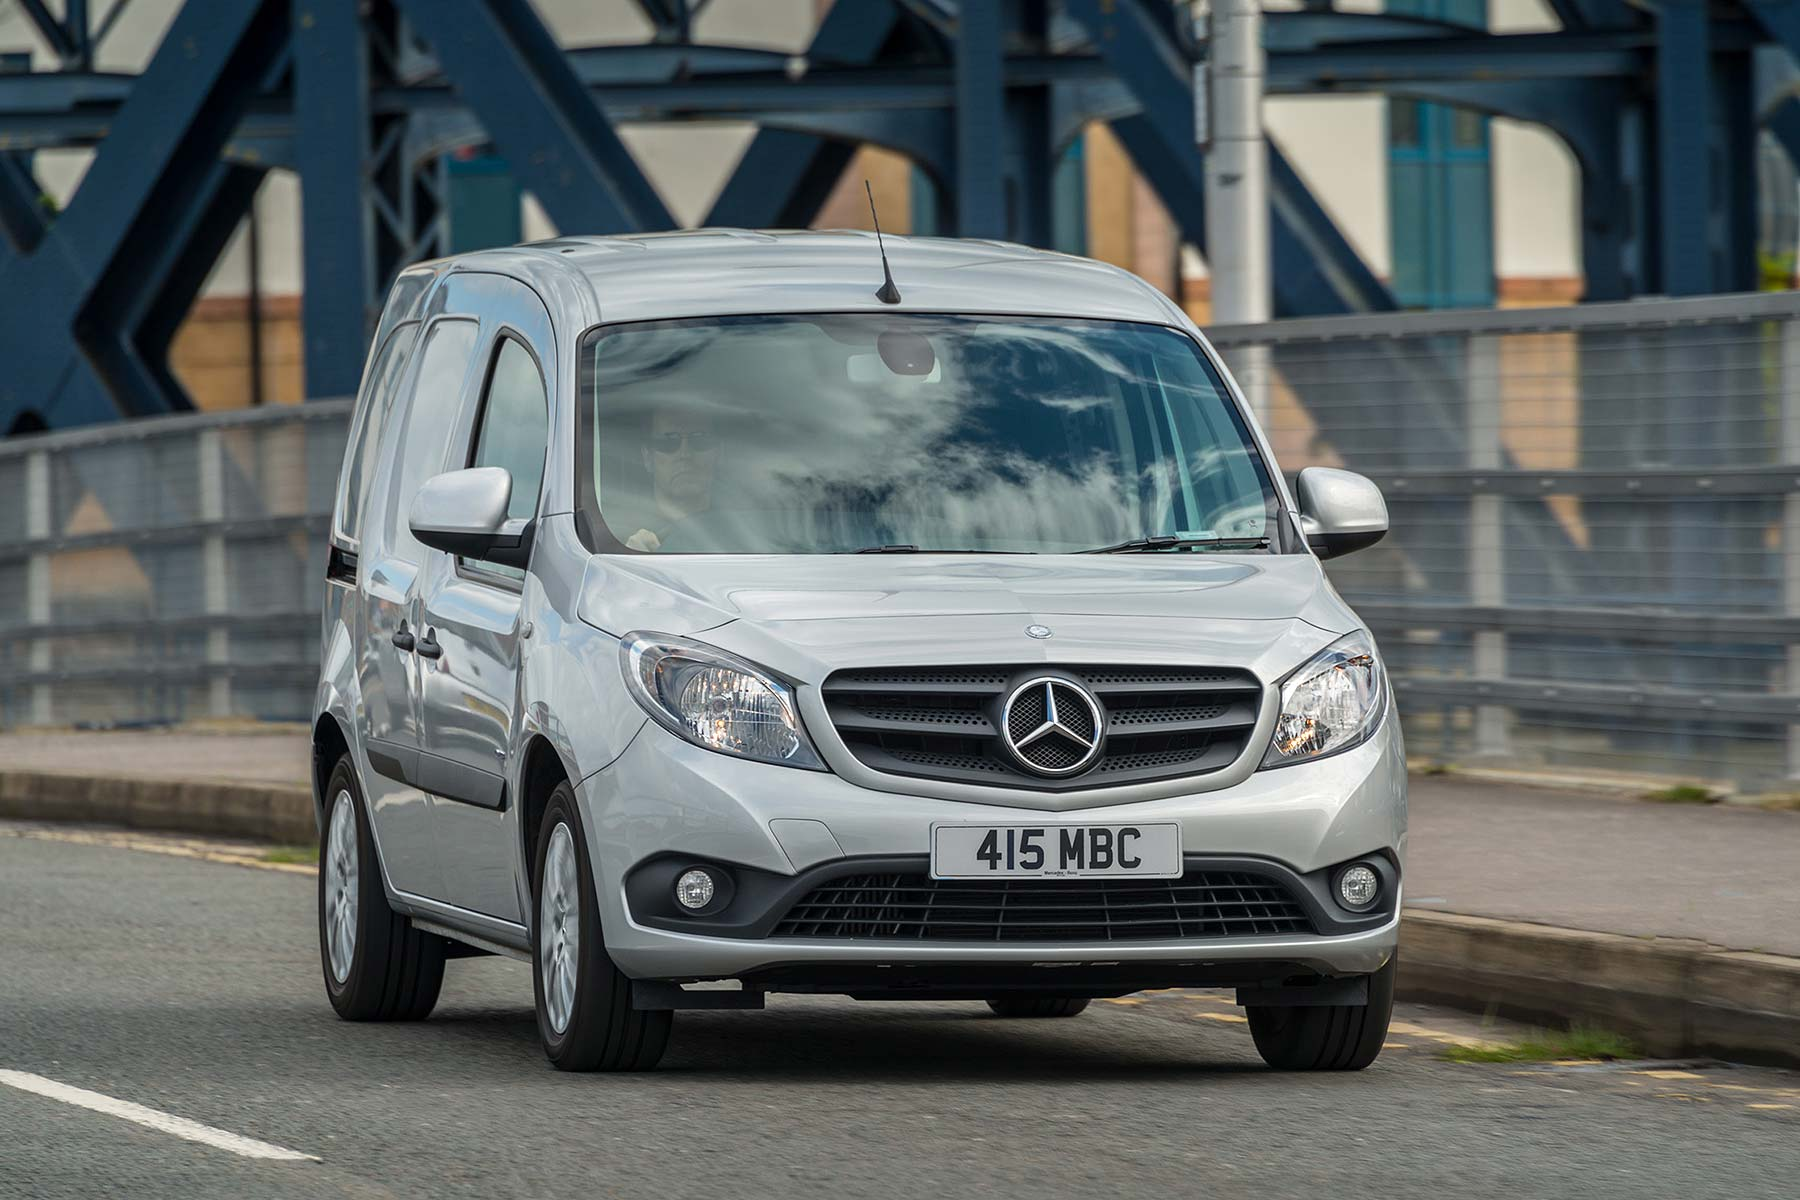 Mercedes-Benz Citan van